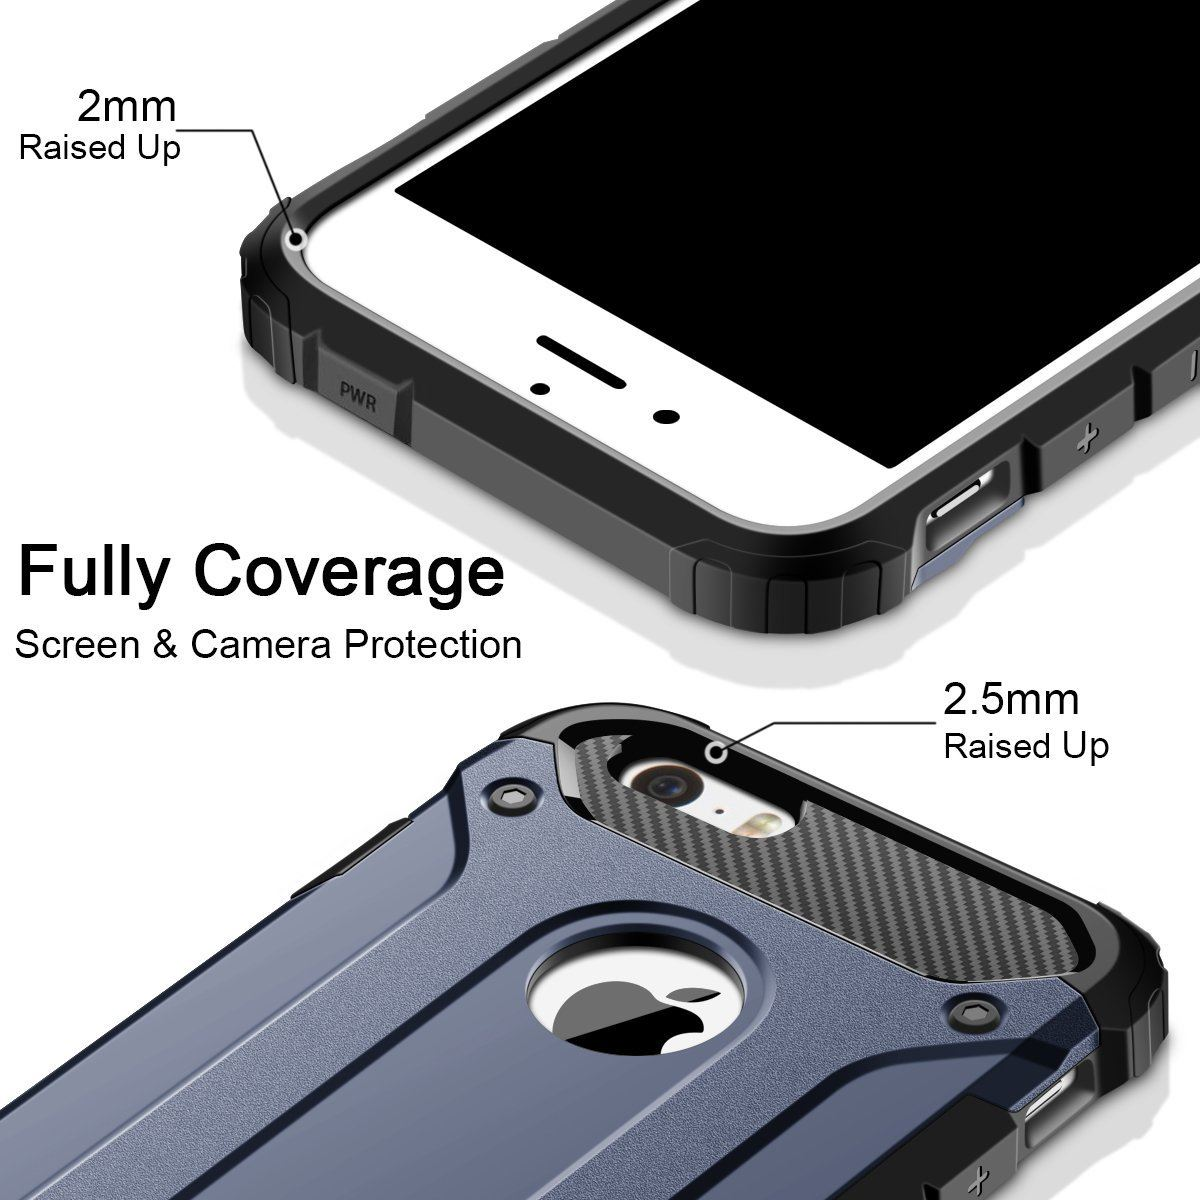 thumbnail 50 - For Apple iPhone 11 Pro Max XR Xs X 8 7 Plus 6 5 Se Case Cover Tough Armor